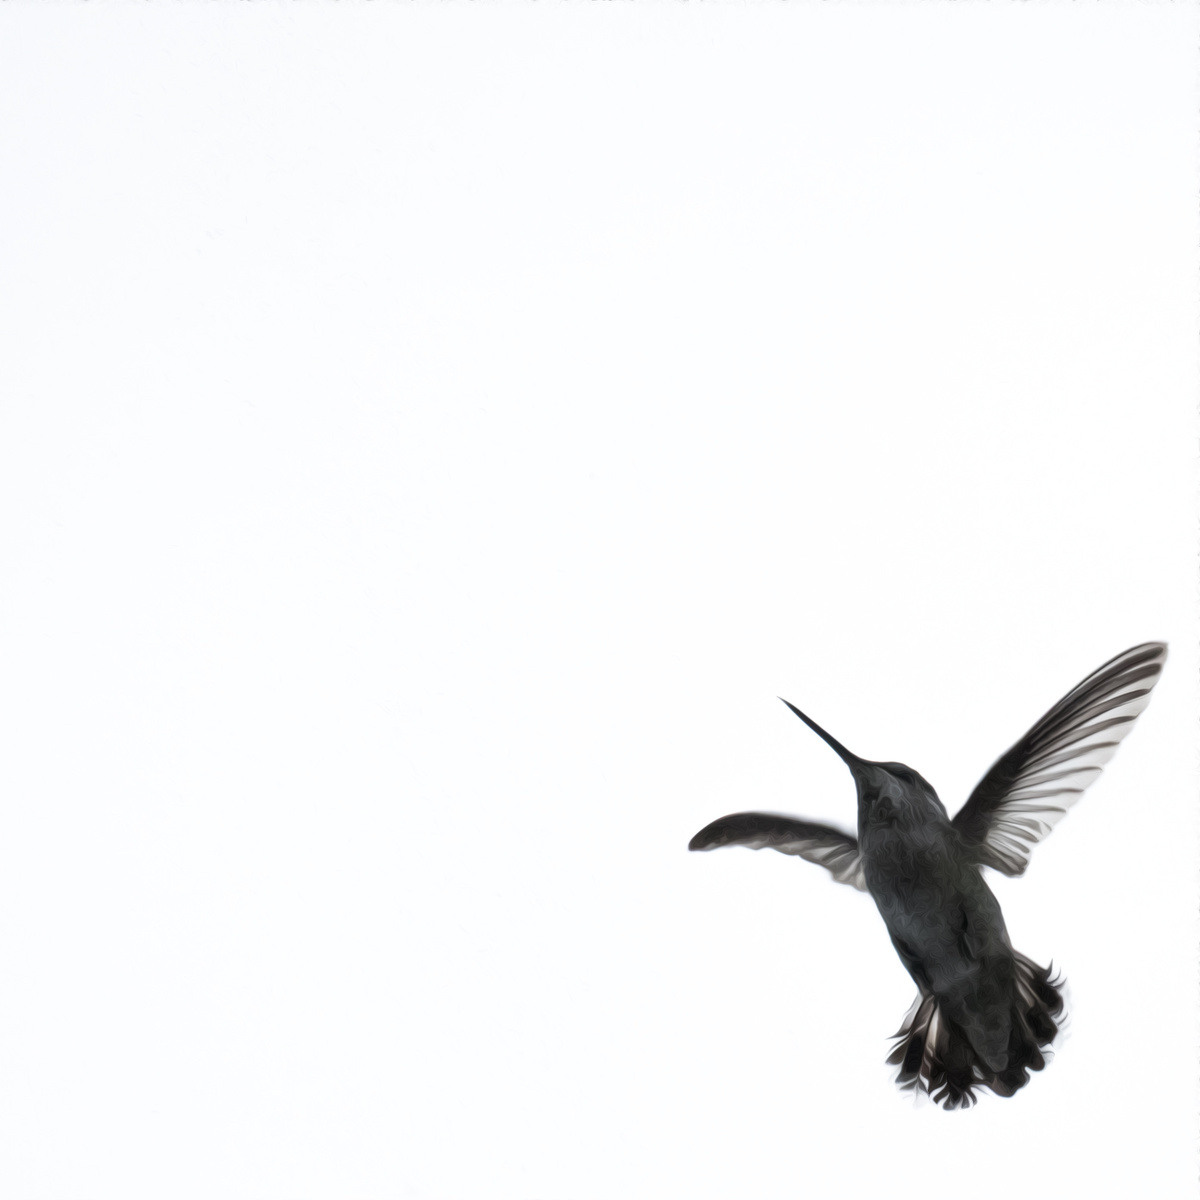 hummingbird takes flight